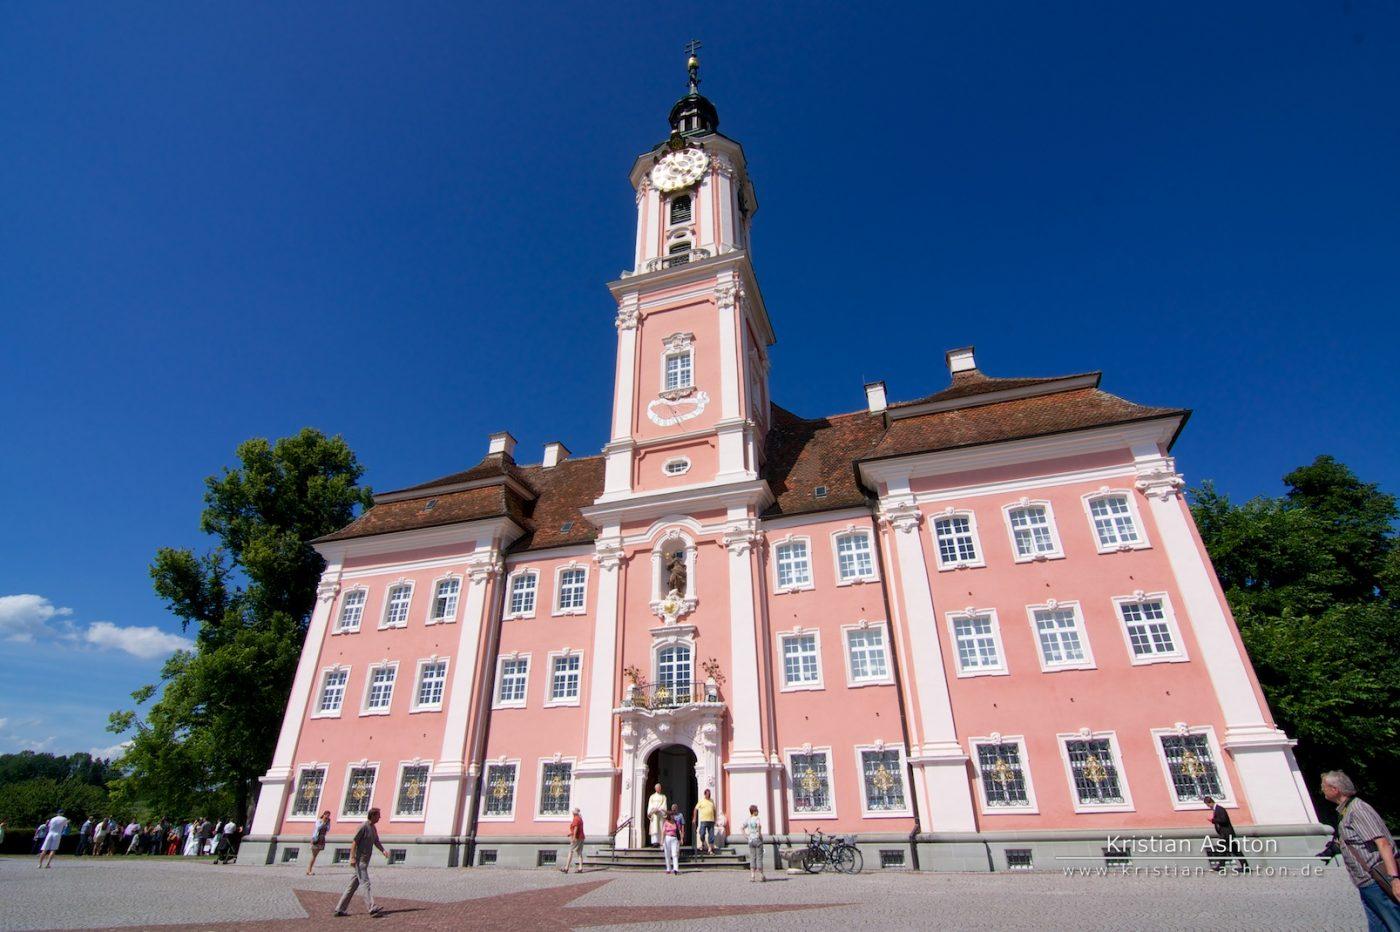 Birnau basilica on Lake Constance